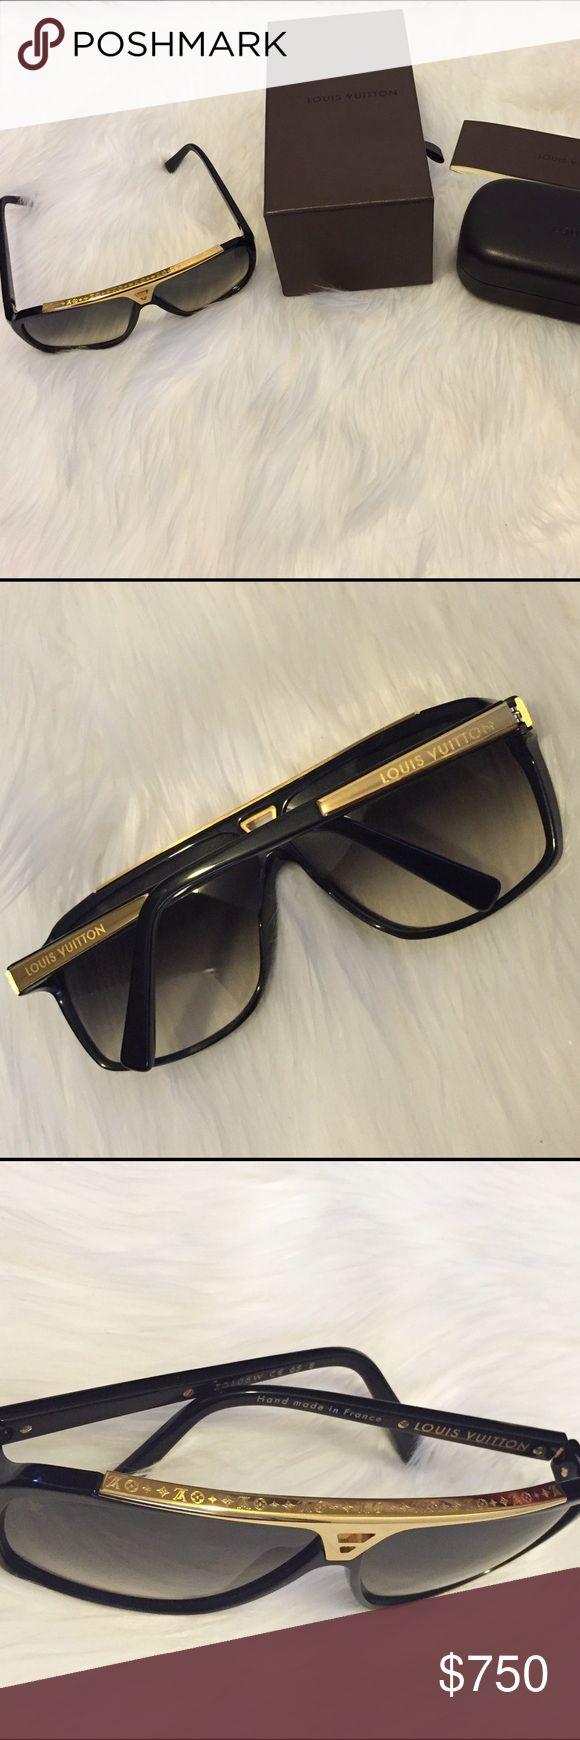 e8f9a5d1296 Louis Vuitton Aviator Sunglasses Black « Heritage Malta